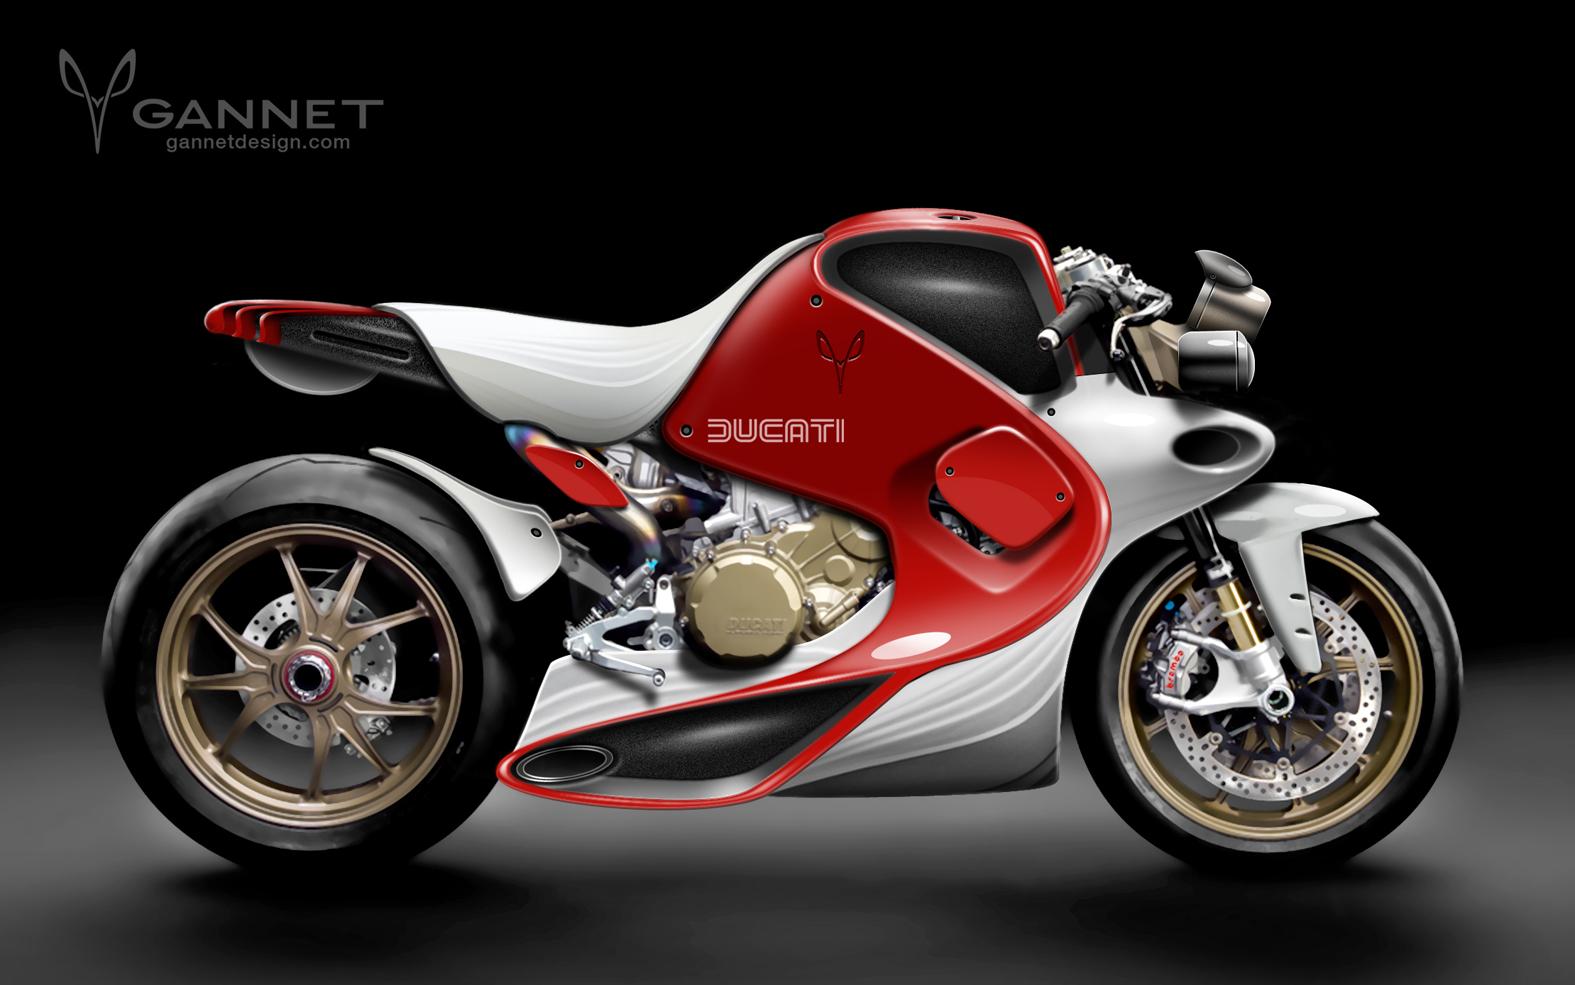 Ducati – GANNET Design